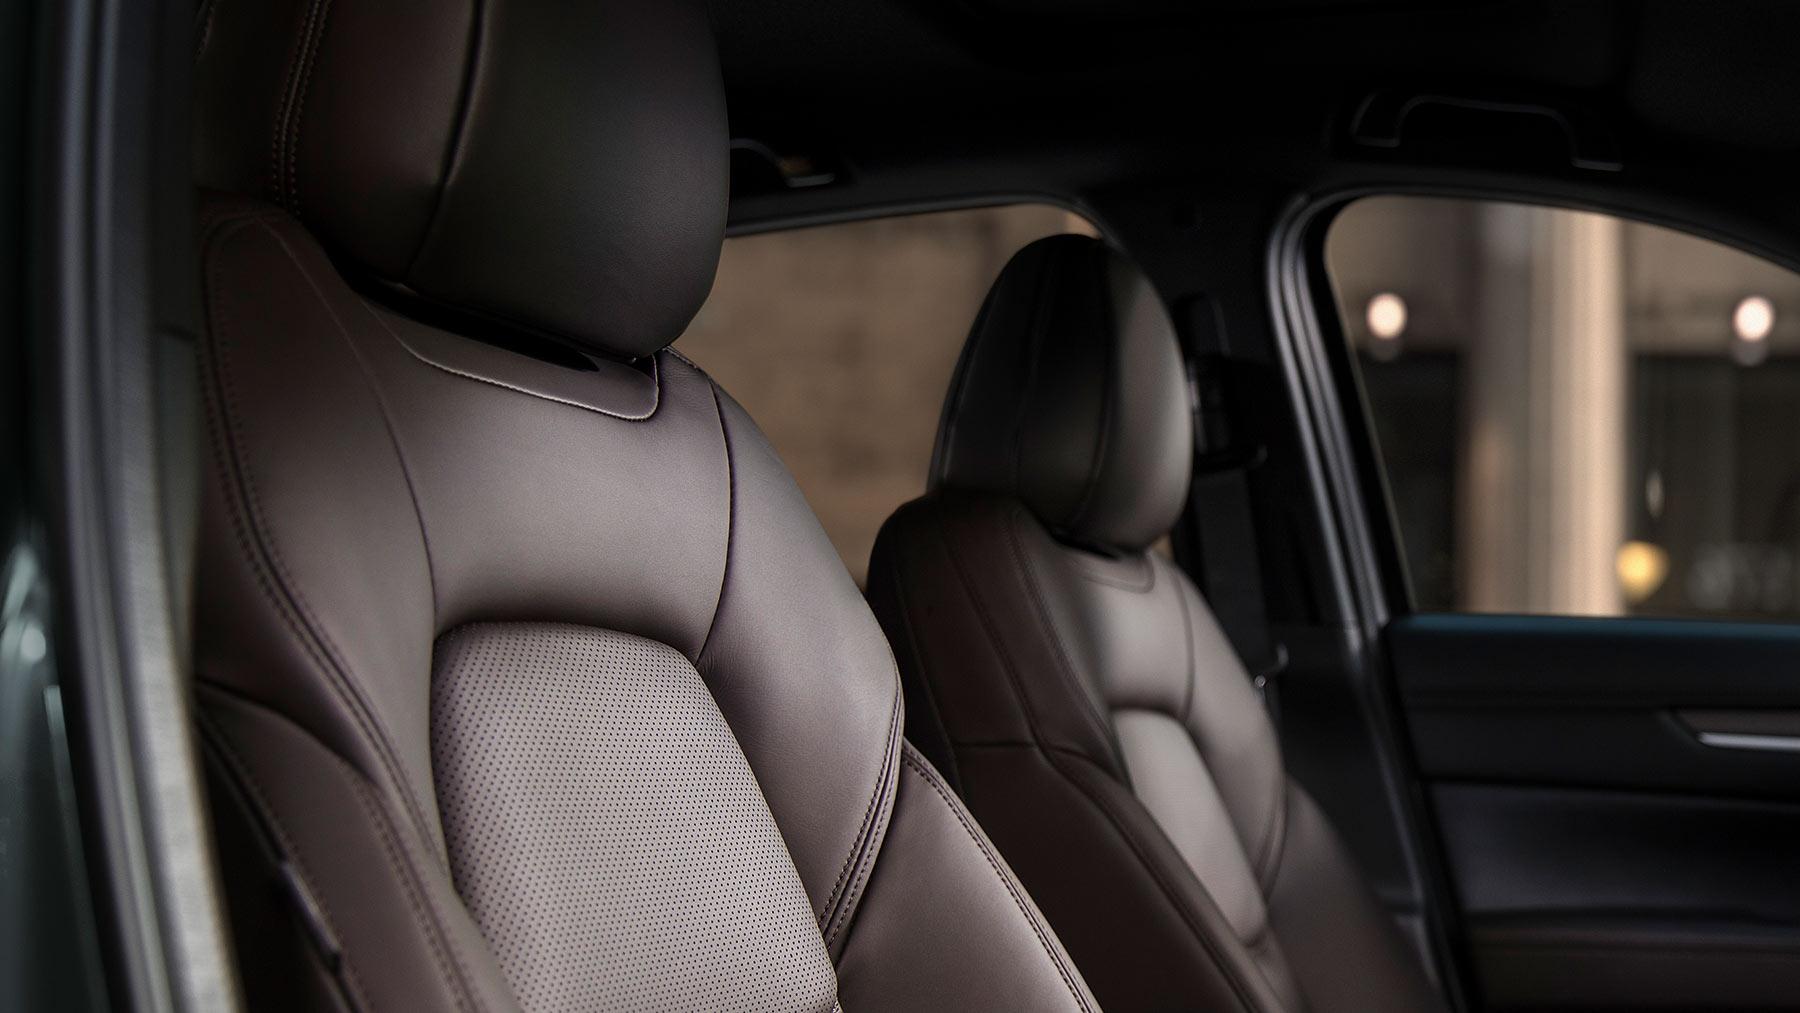 Mazda CX-5 Seating